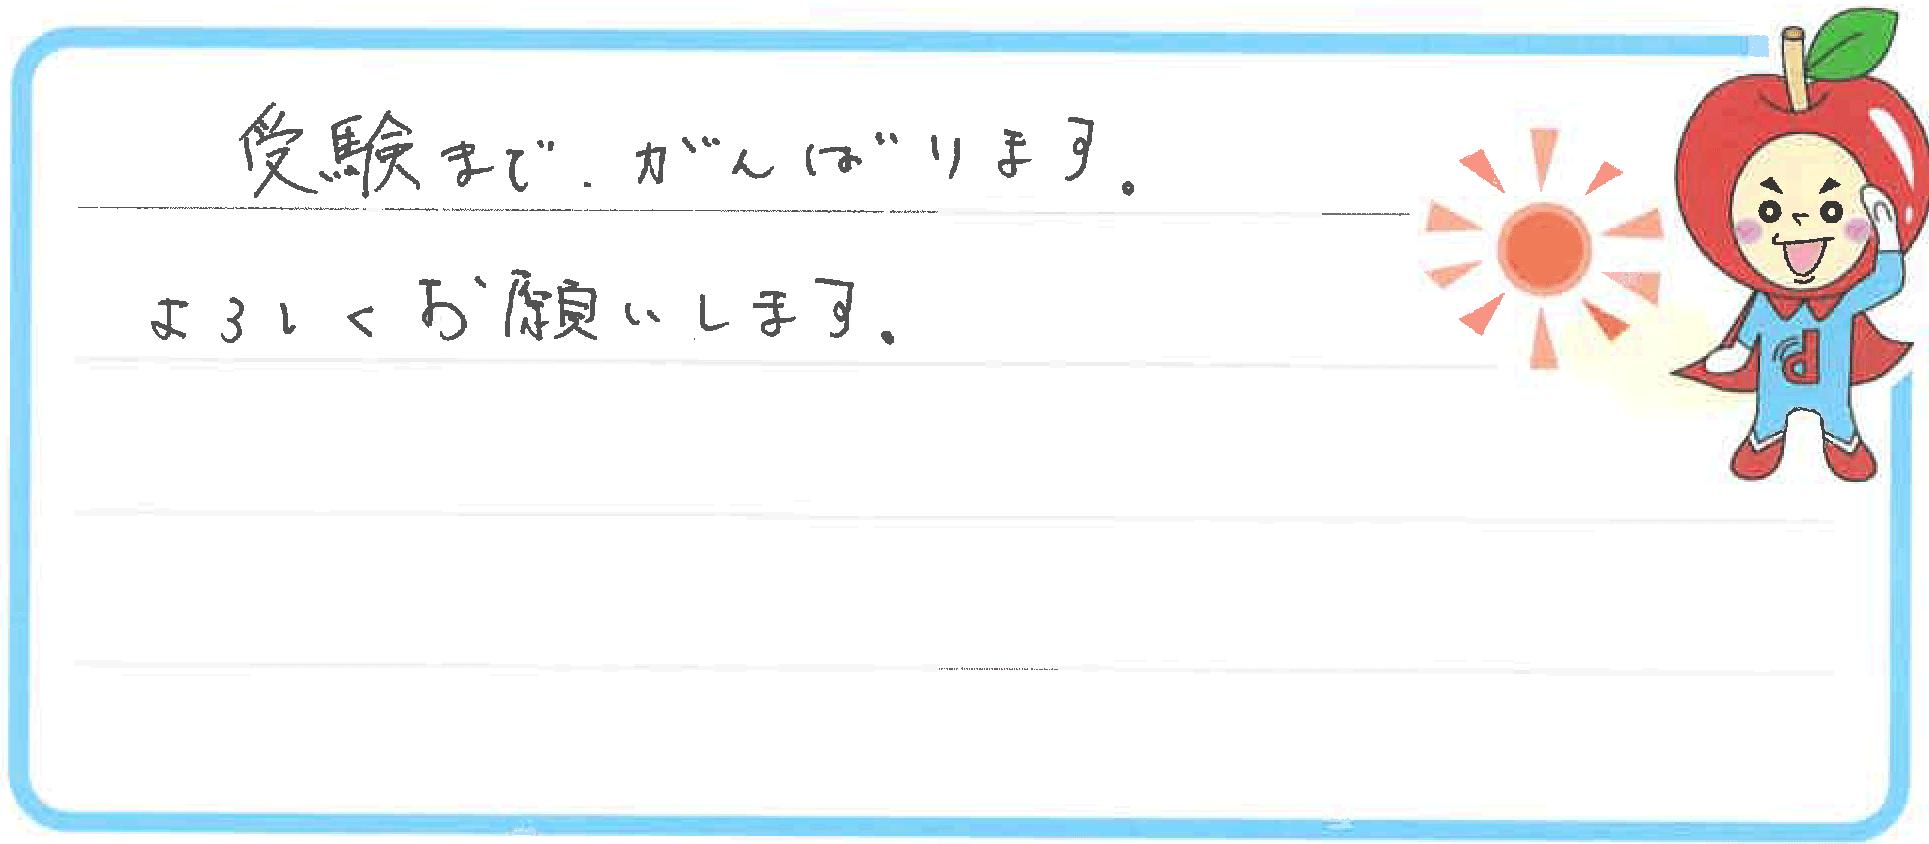 Sちゃん(今治市)からの口コミ